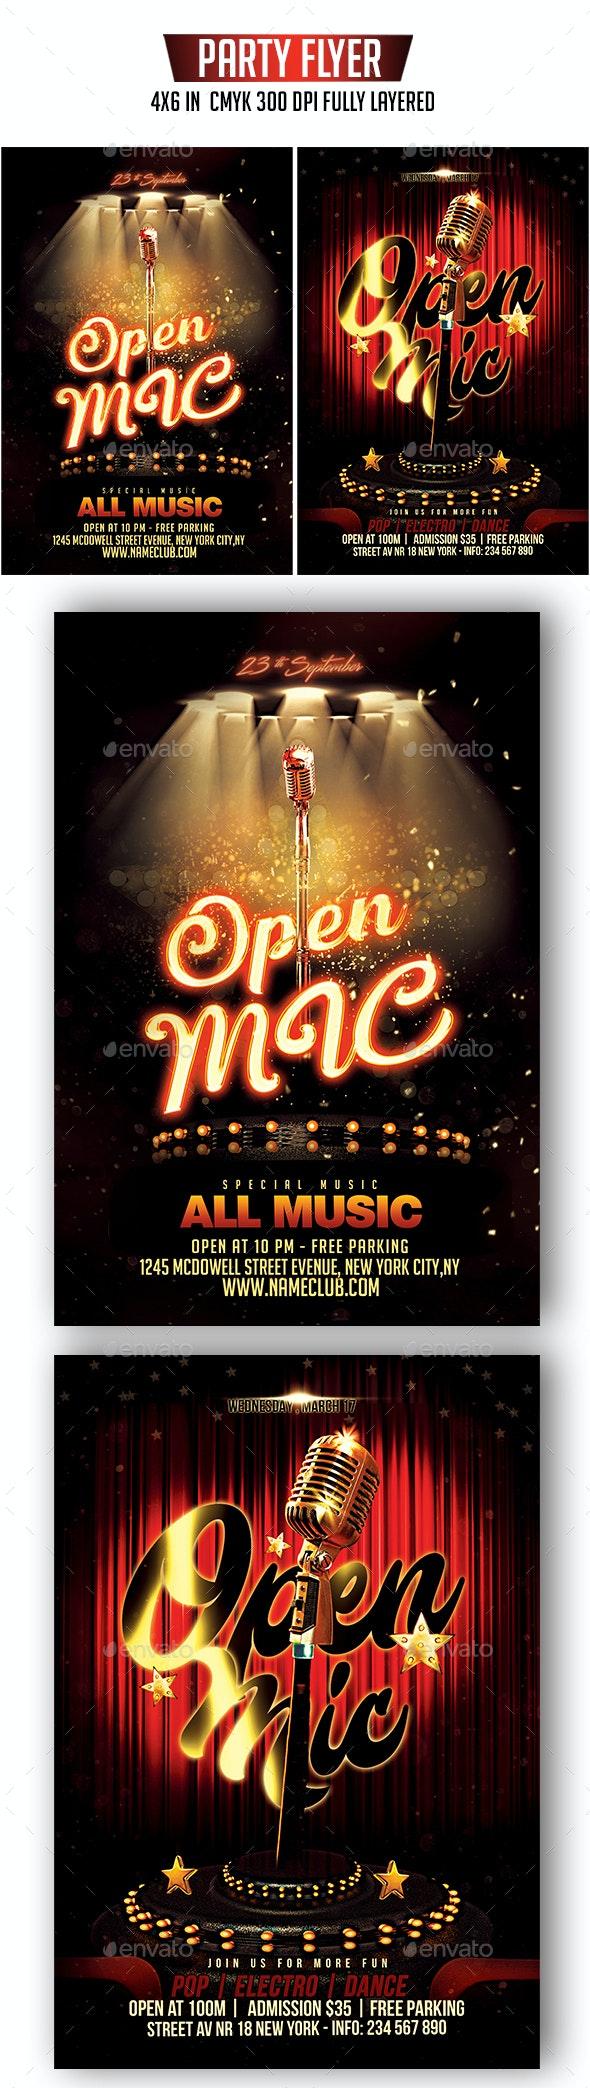 Open Mic Flyer Bundle - Clubs & Parties Events